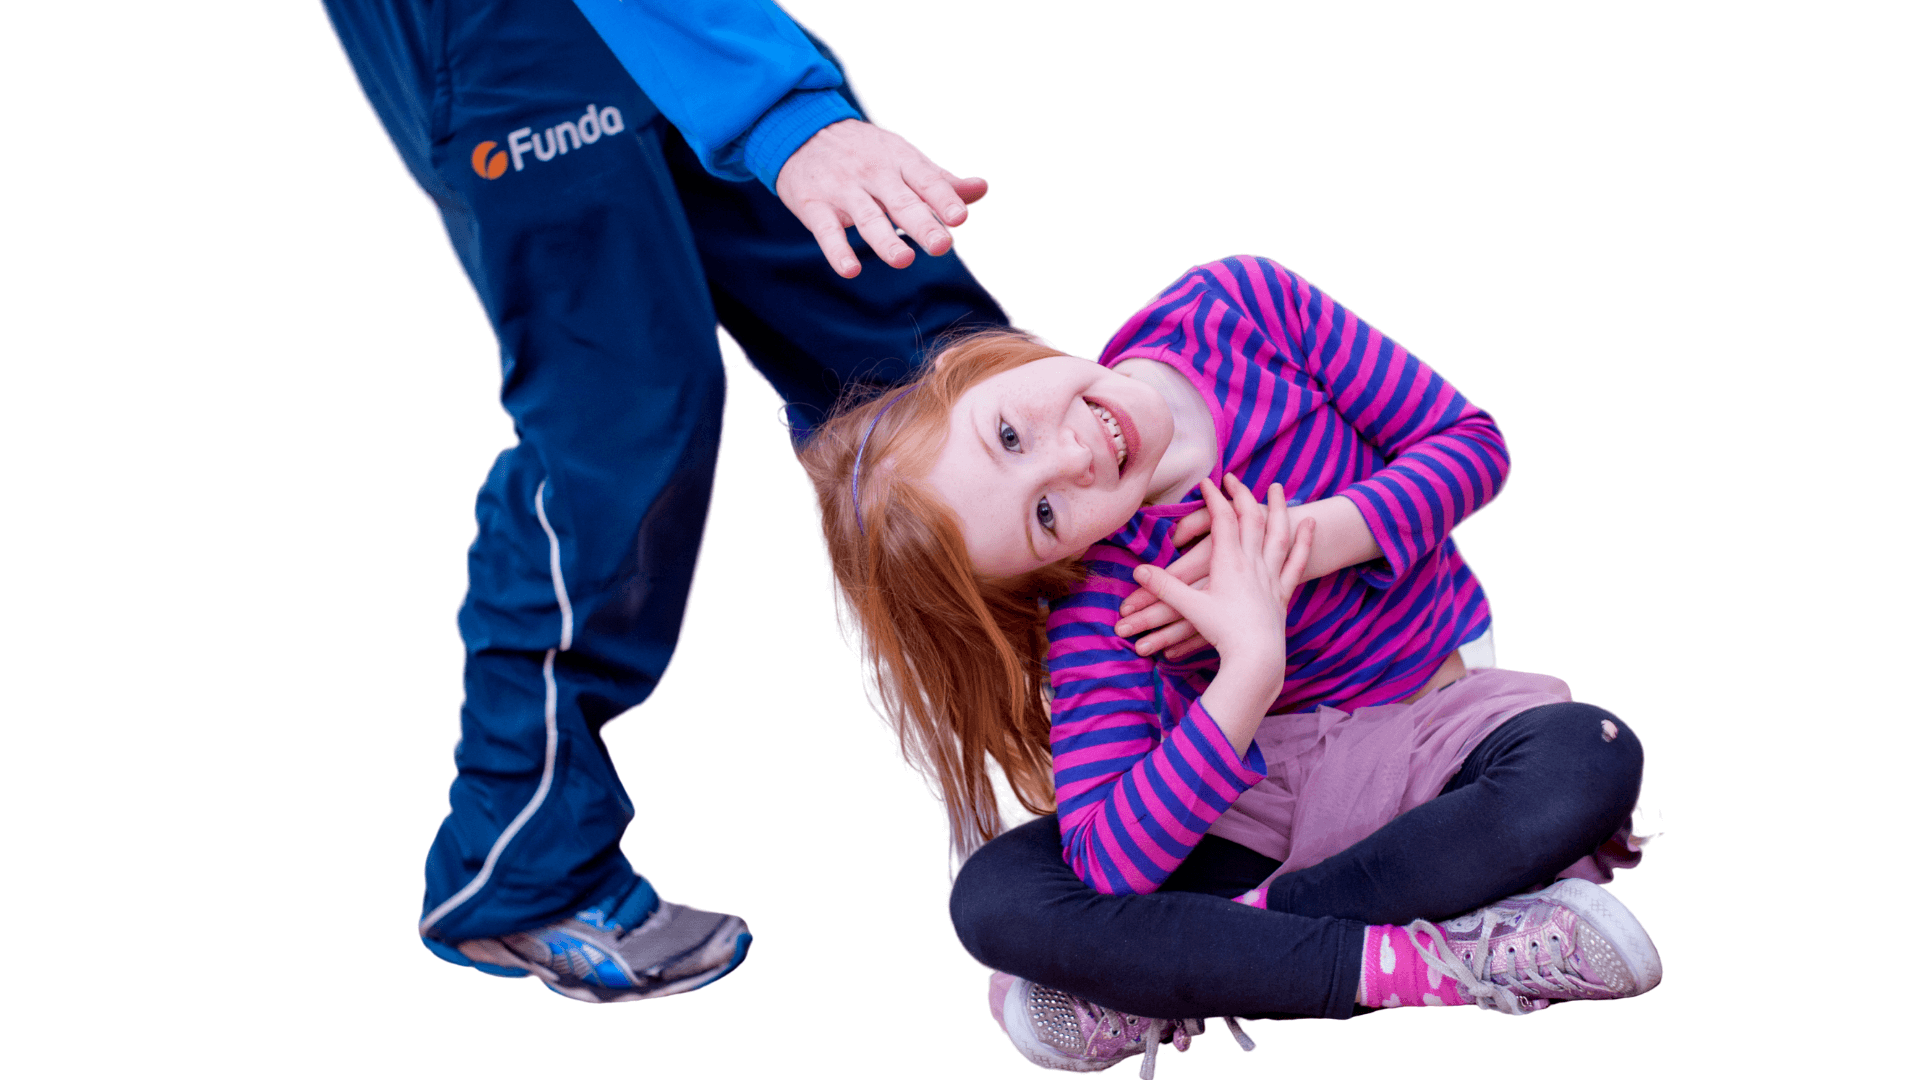 FUNDA Wraparound Childcare